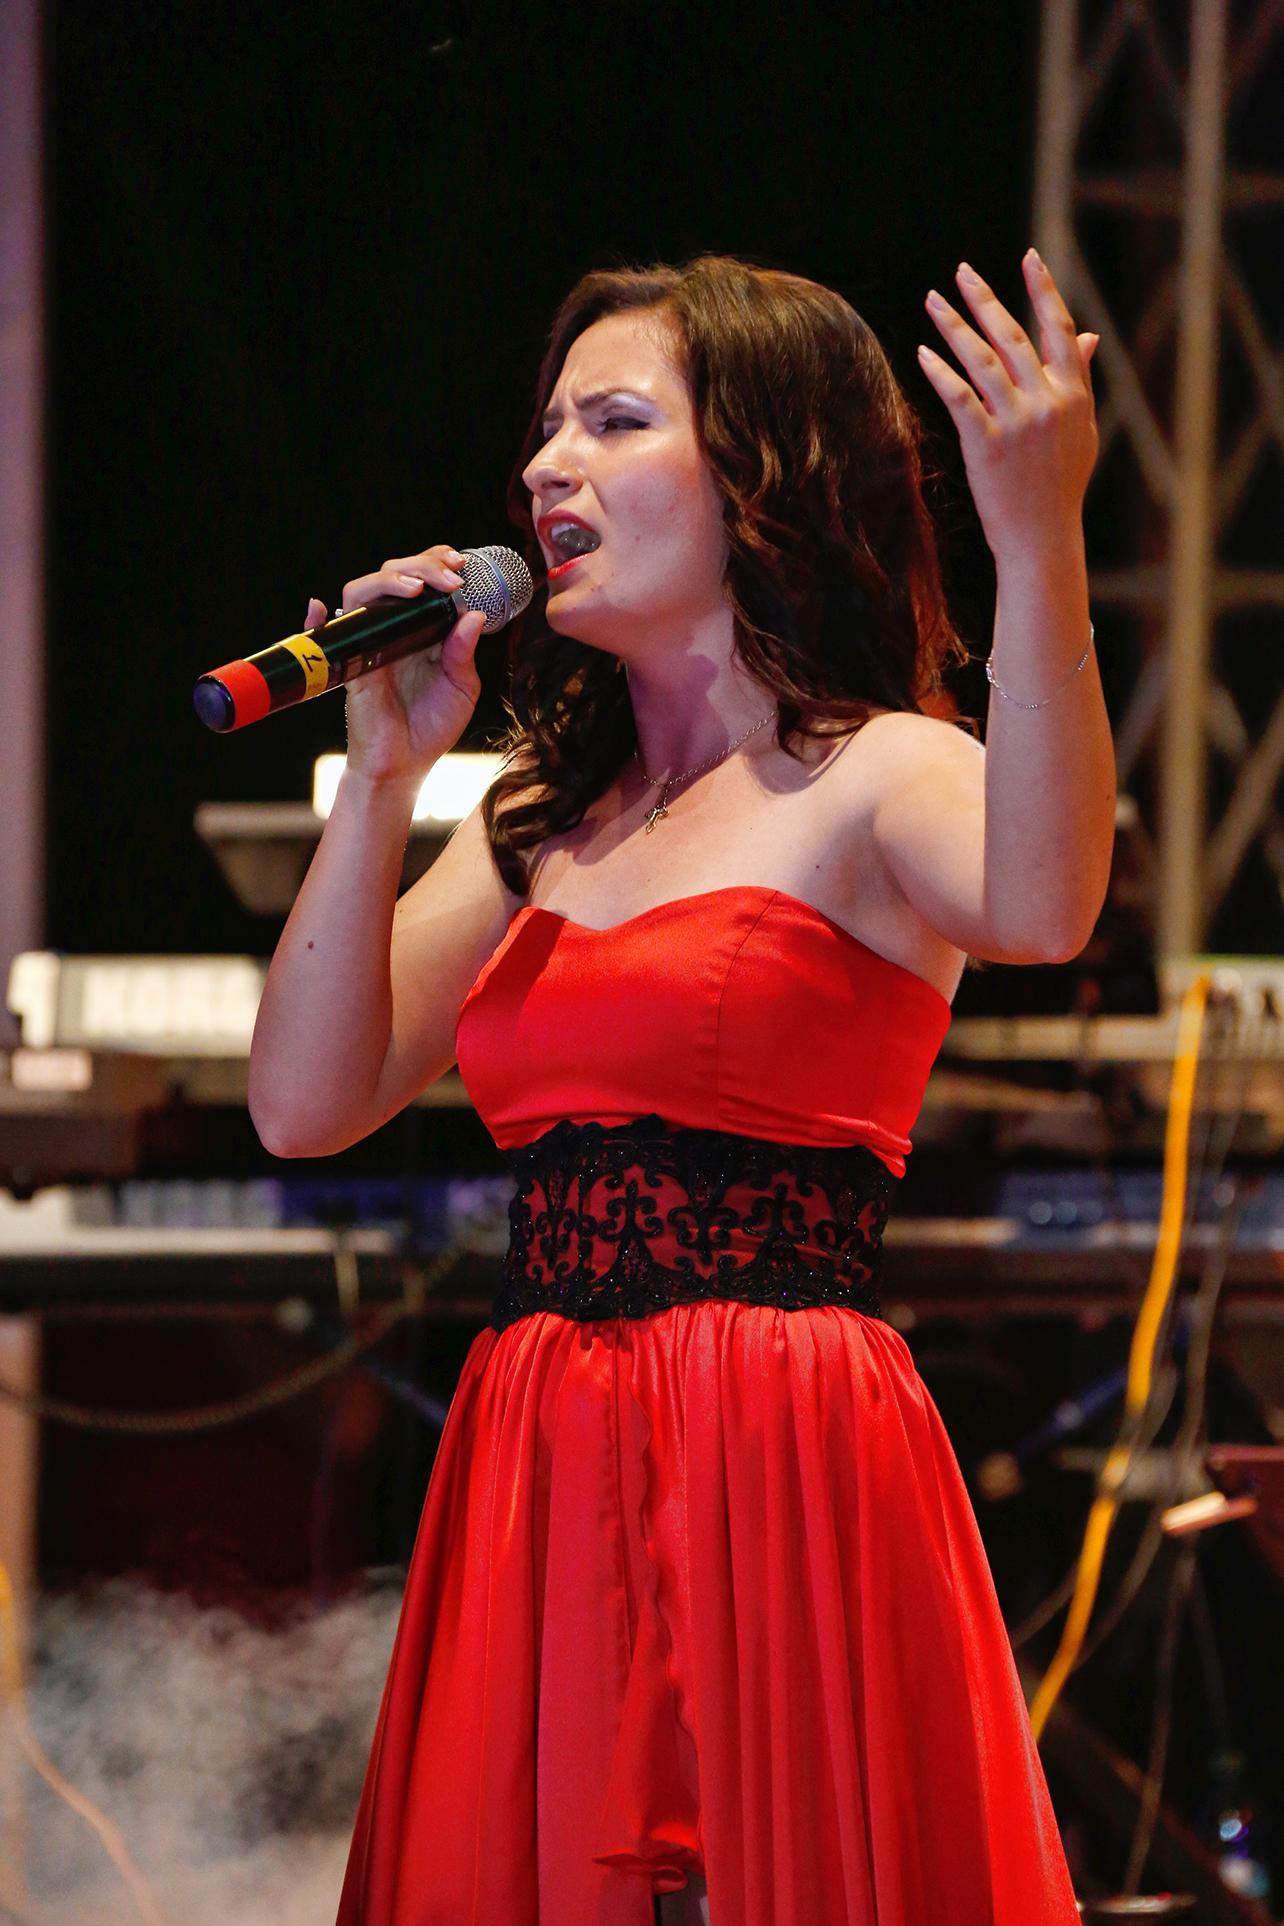 Alina Matache - Premiul de popularitate